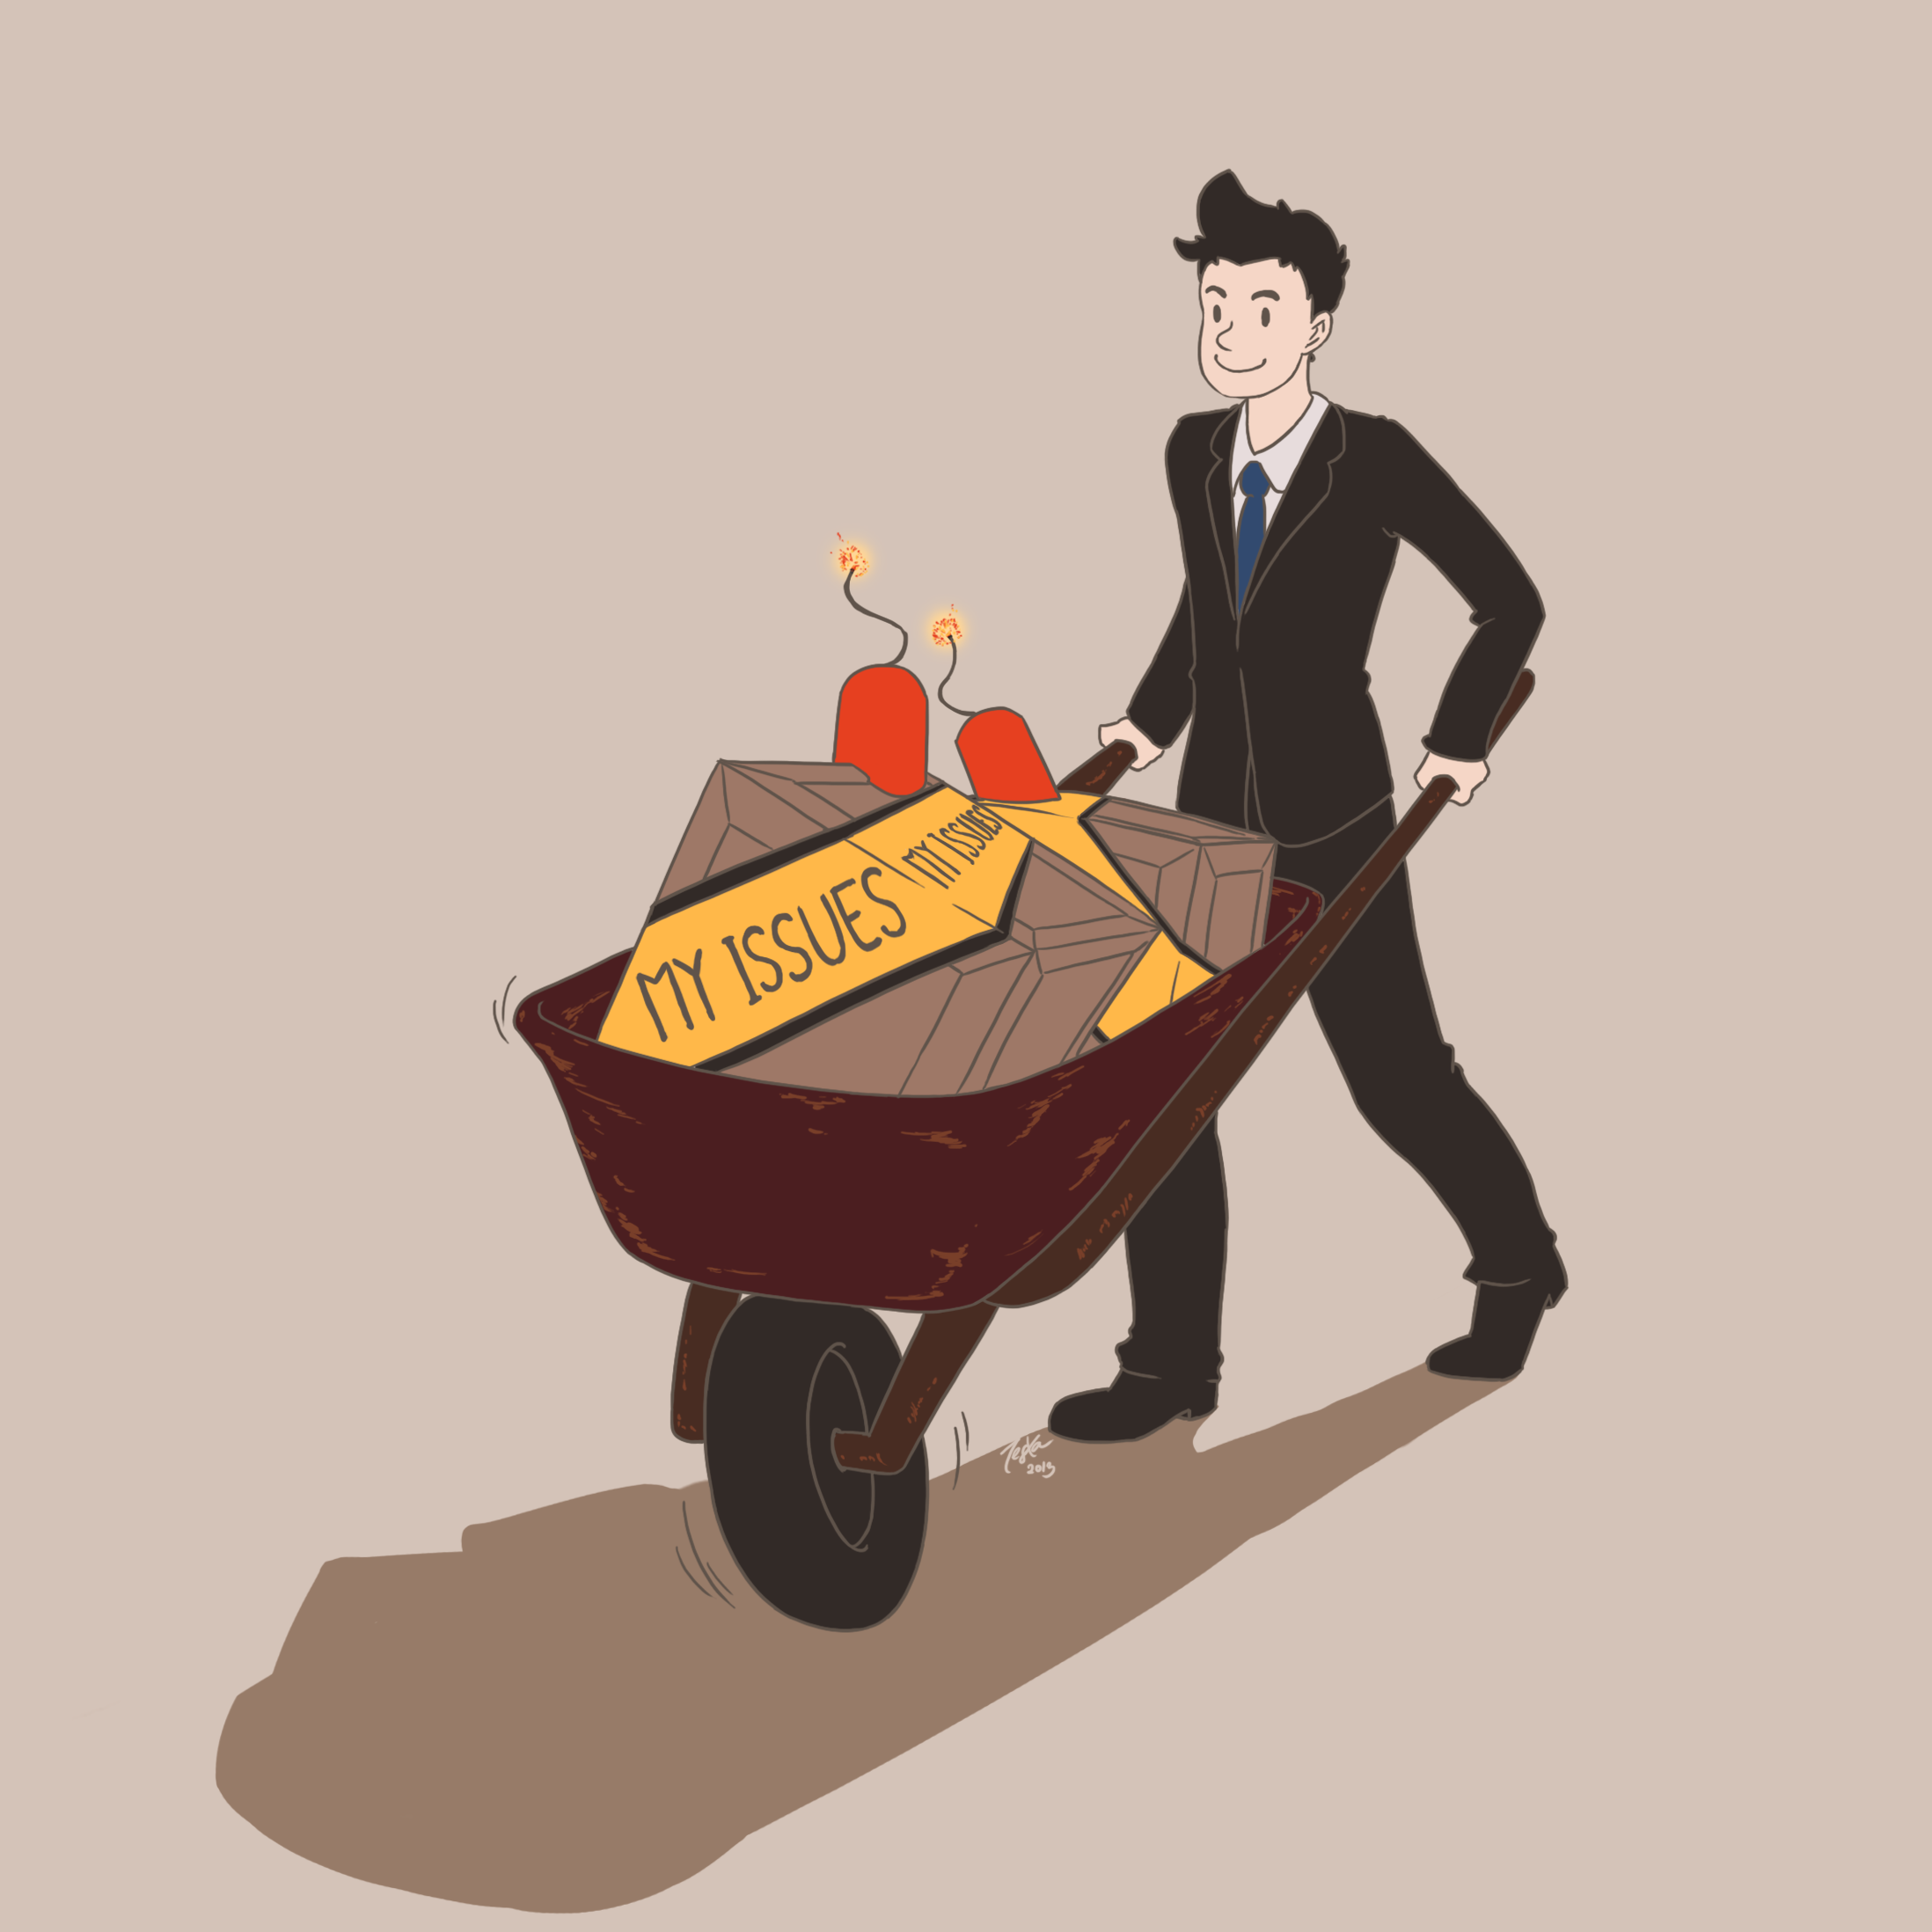 The Wheelbarrow and The Pusher